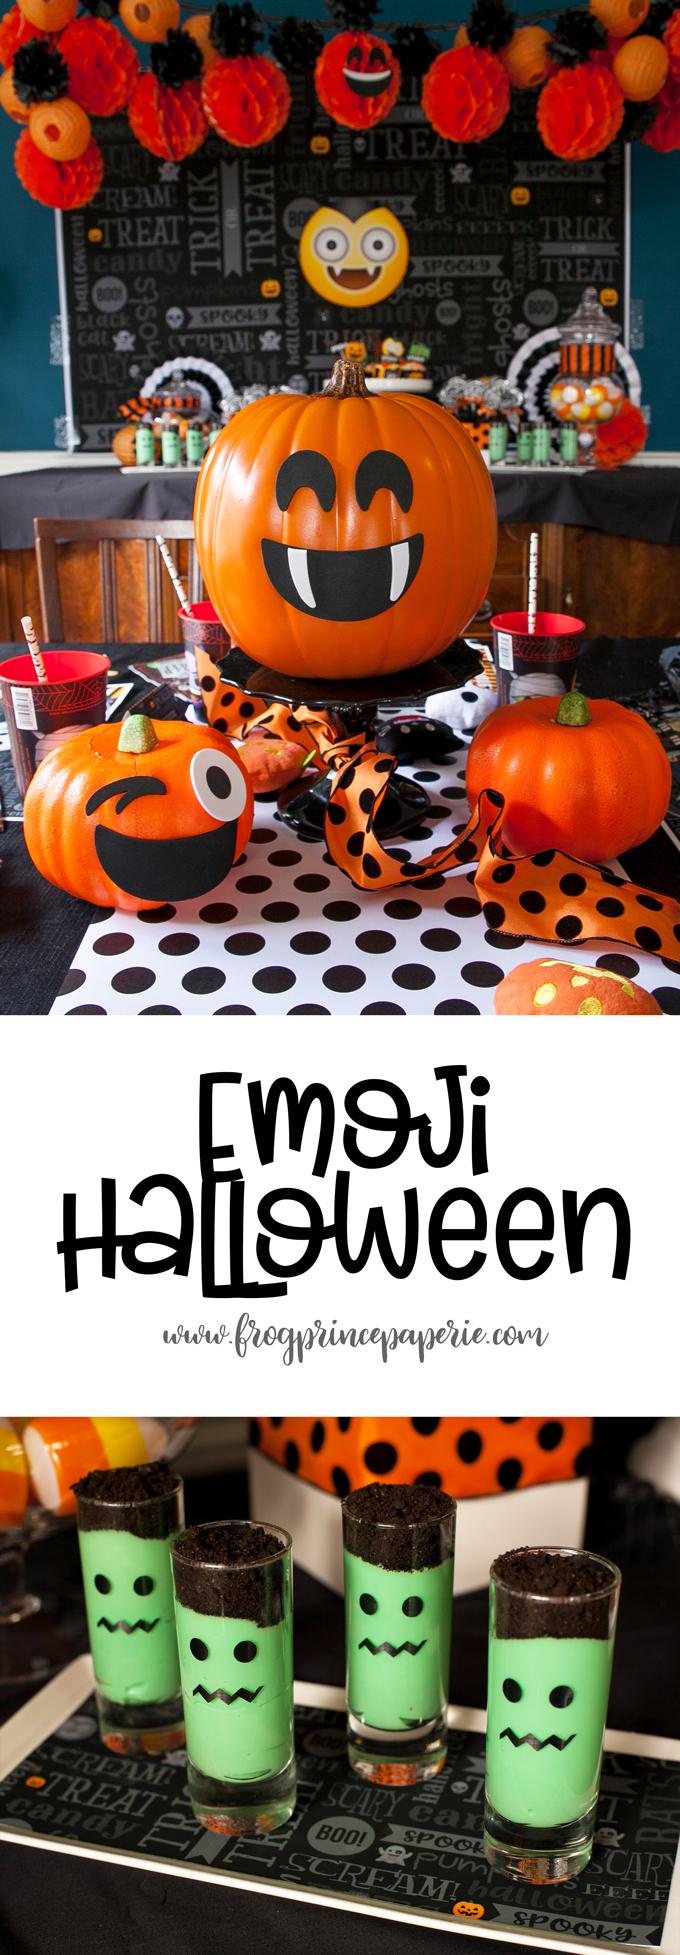 Emoji Halloween Party